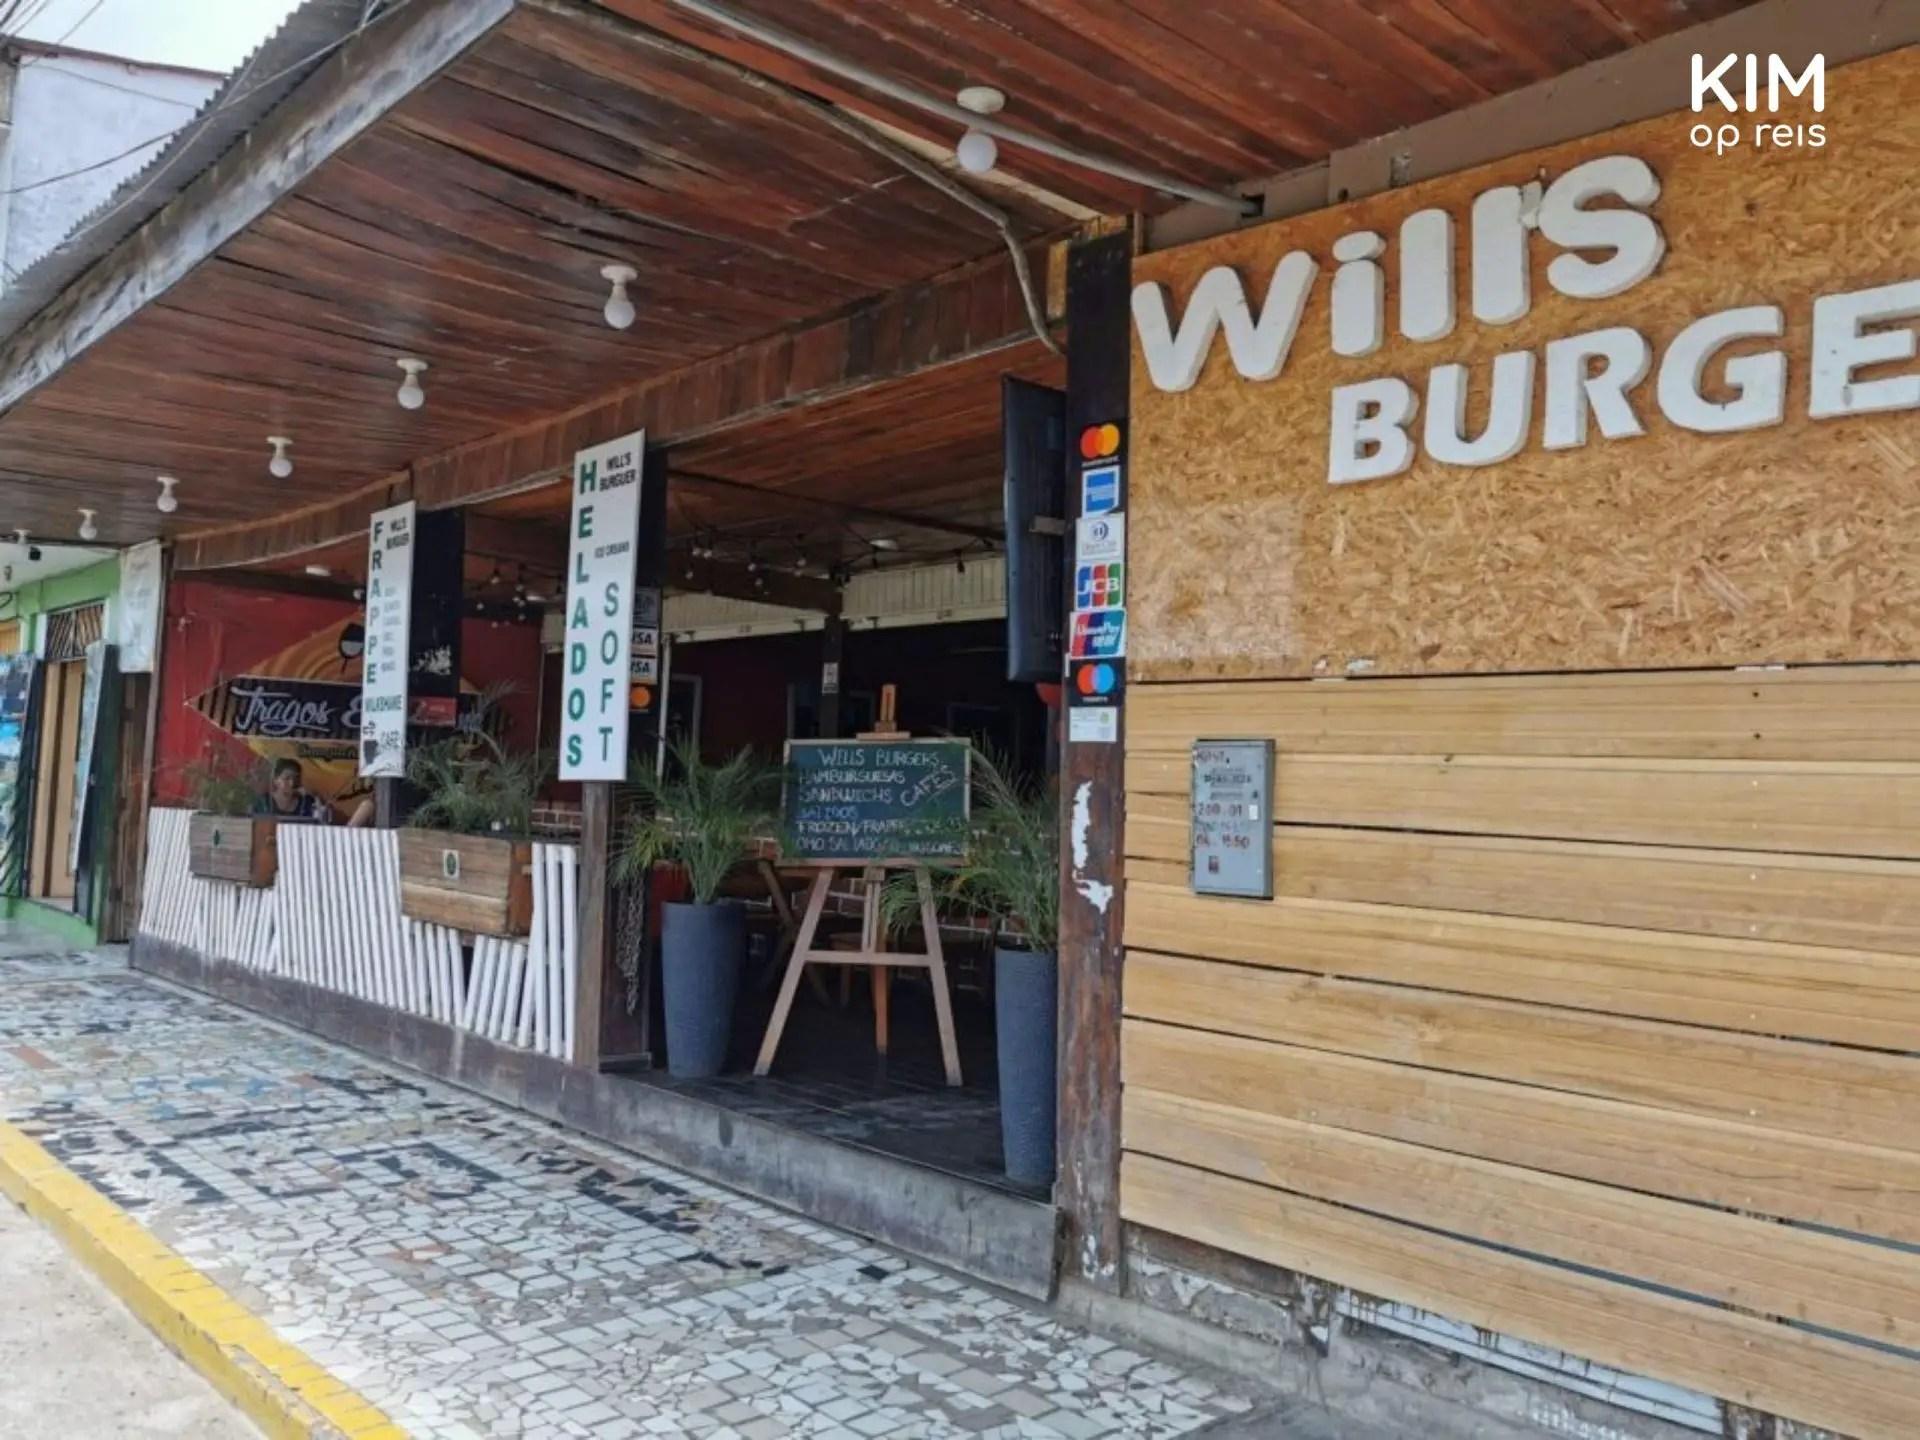 Will's Burger